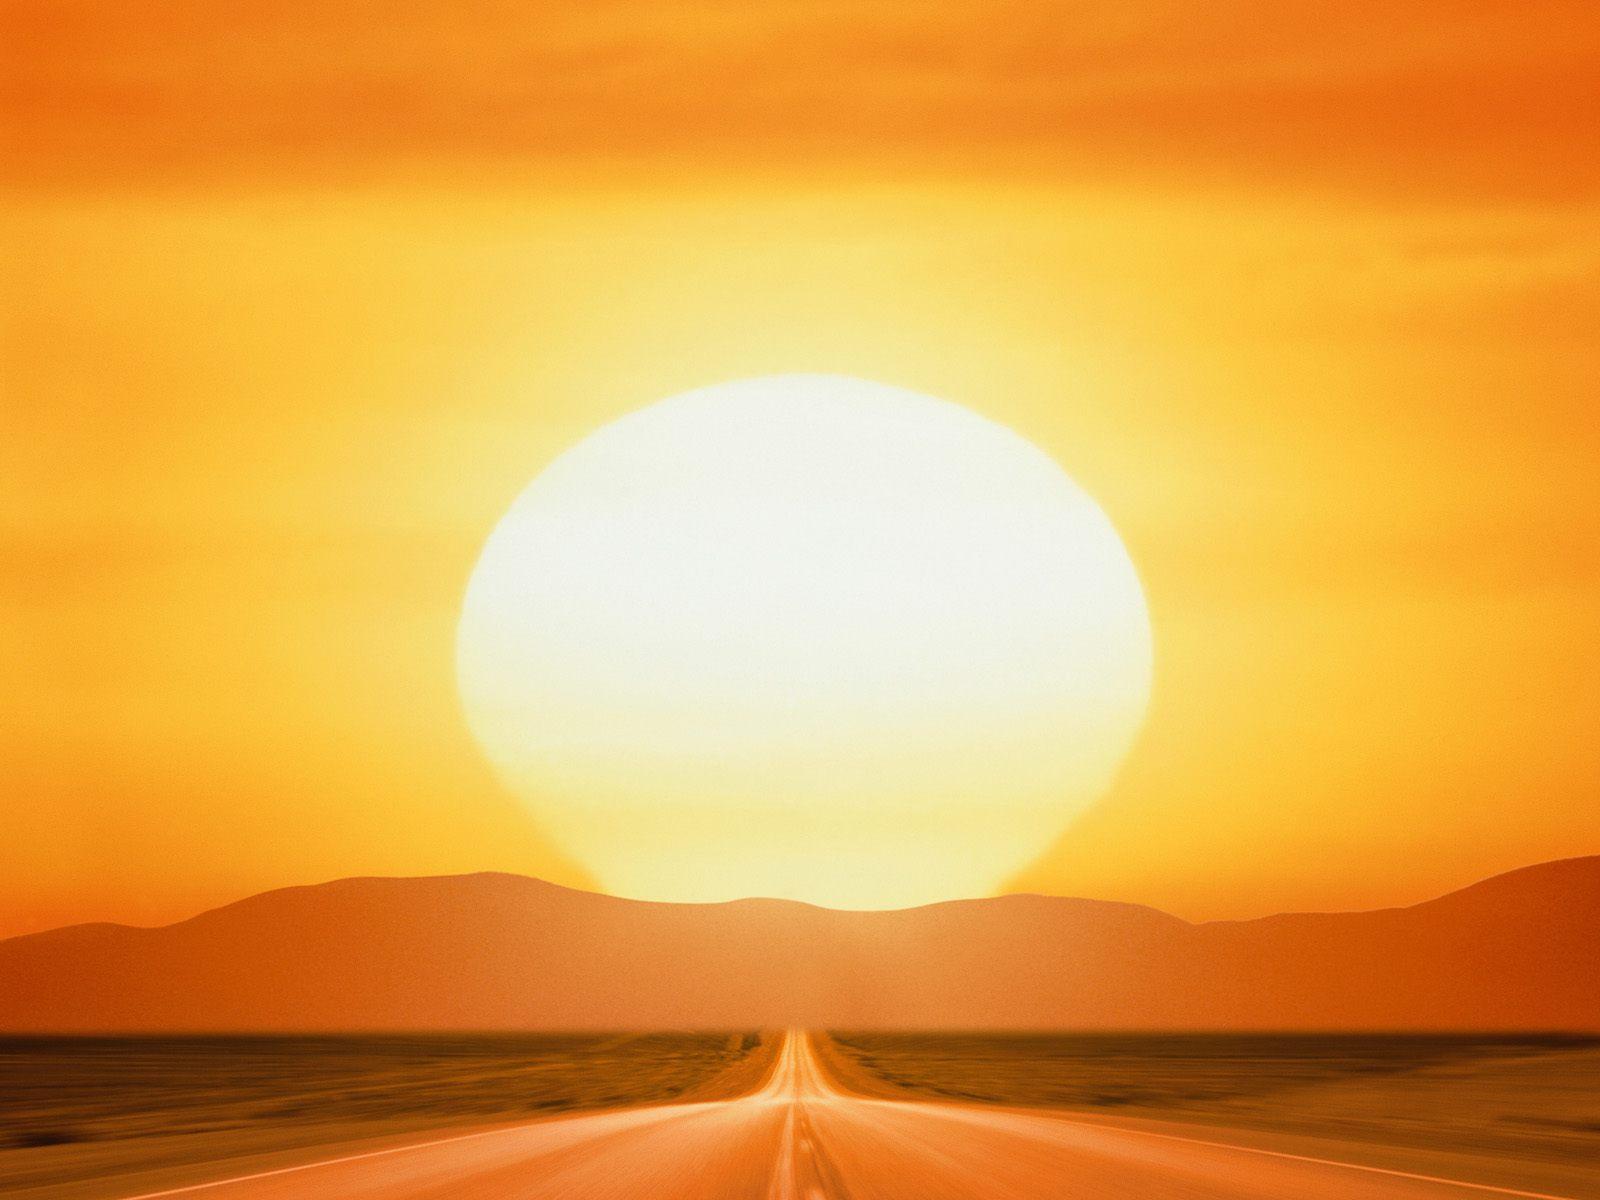 savage_sunset